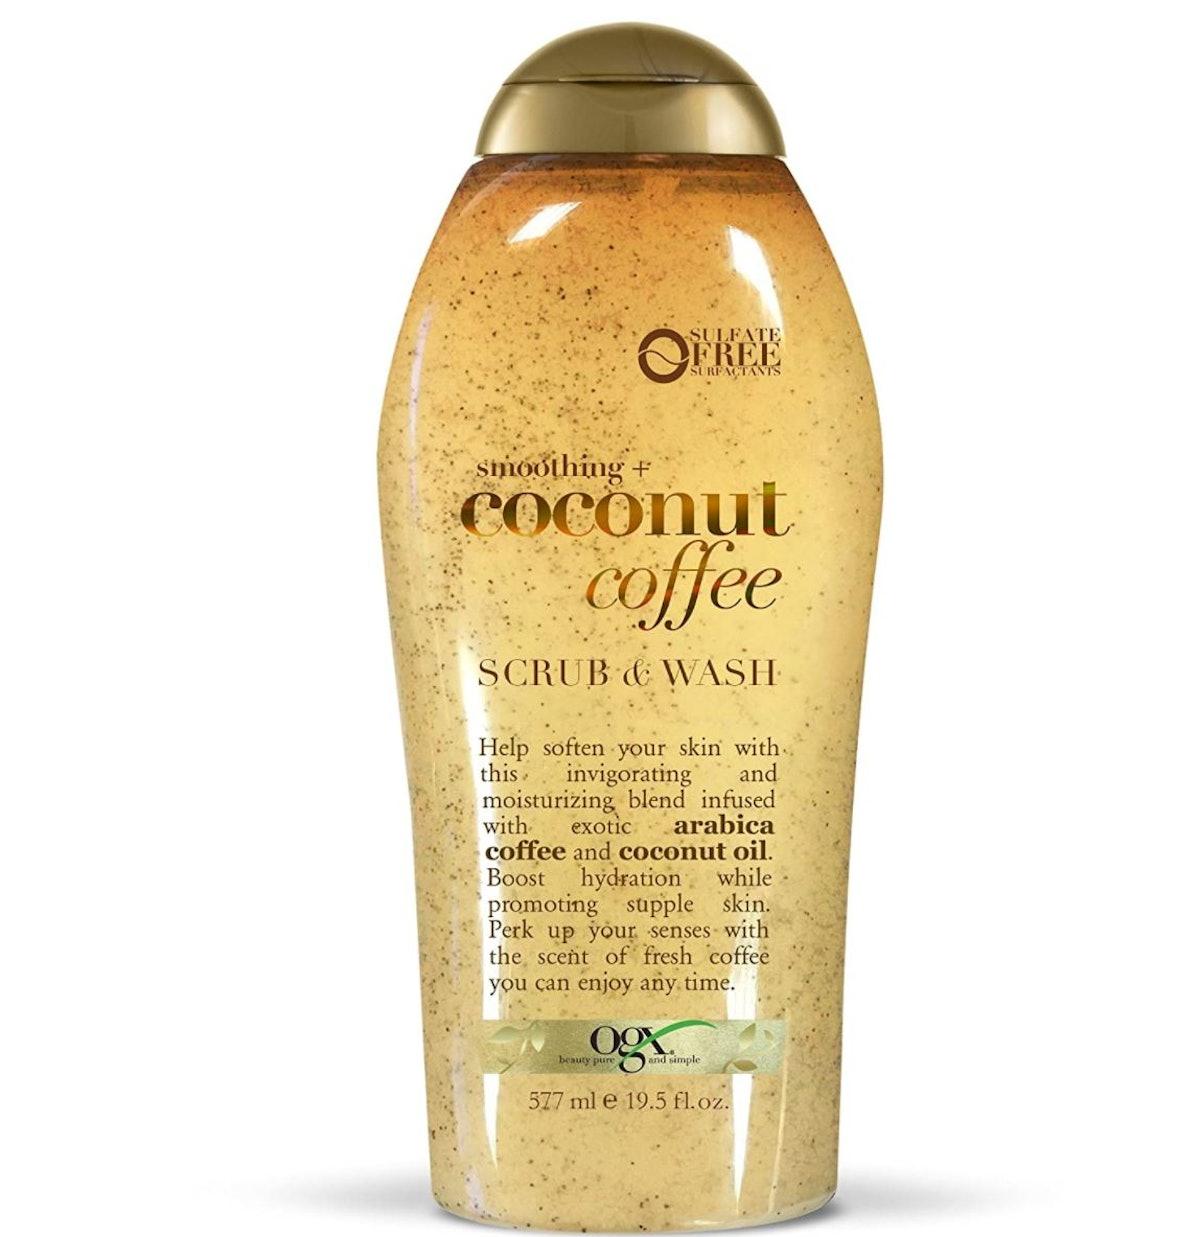 OGX Coffee Scrub and Wash